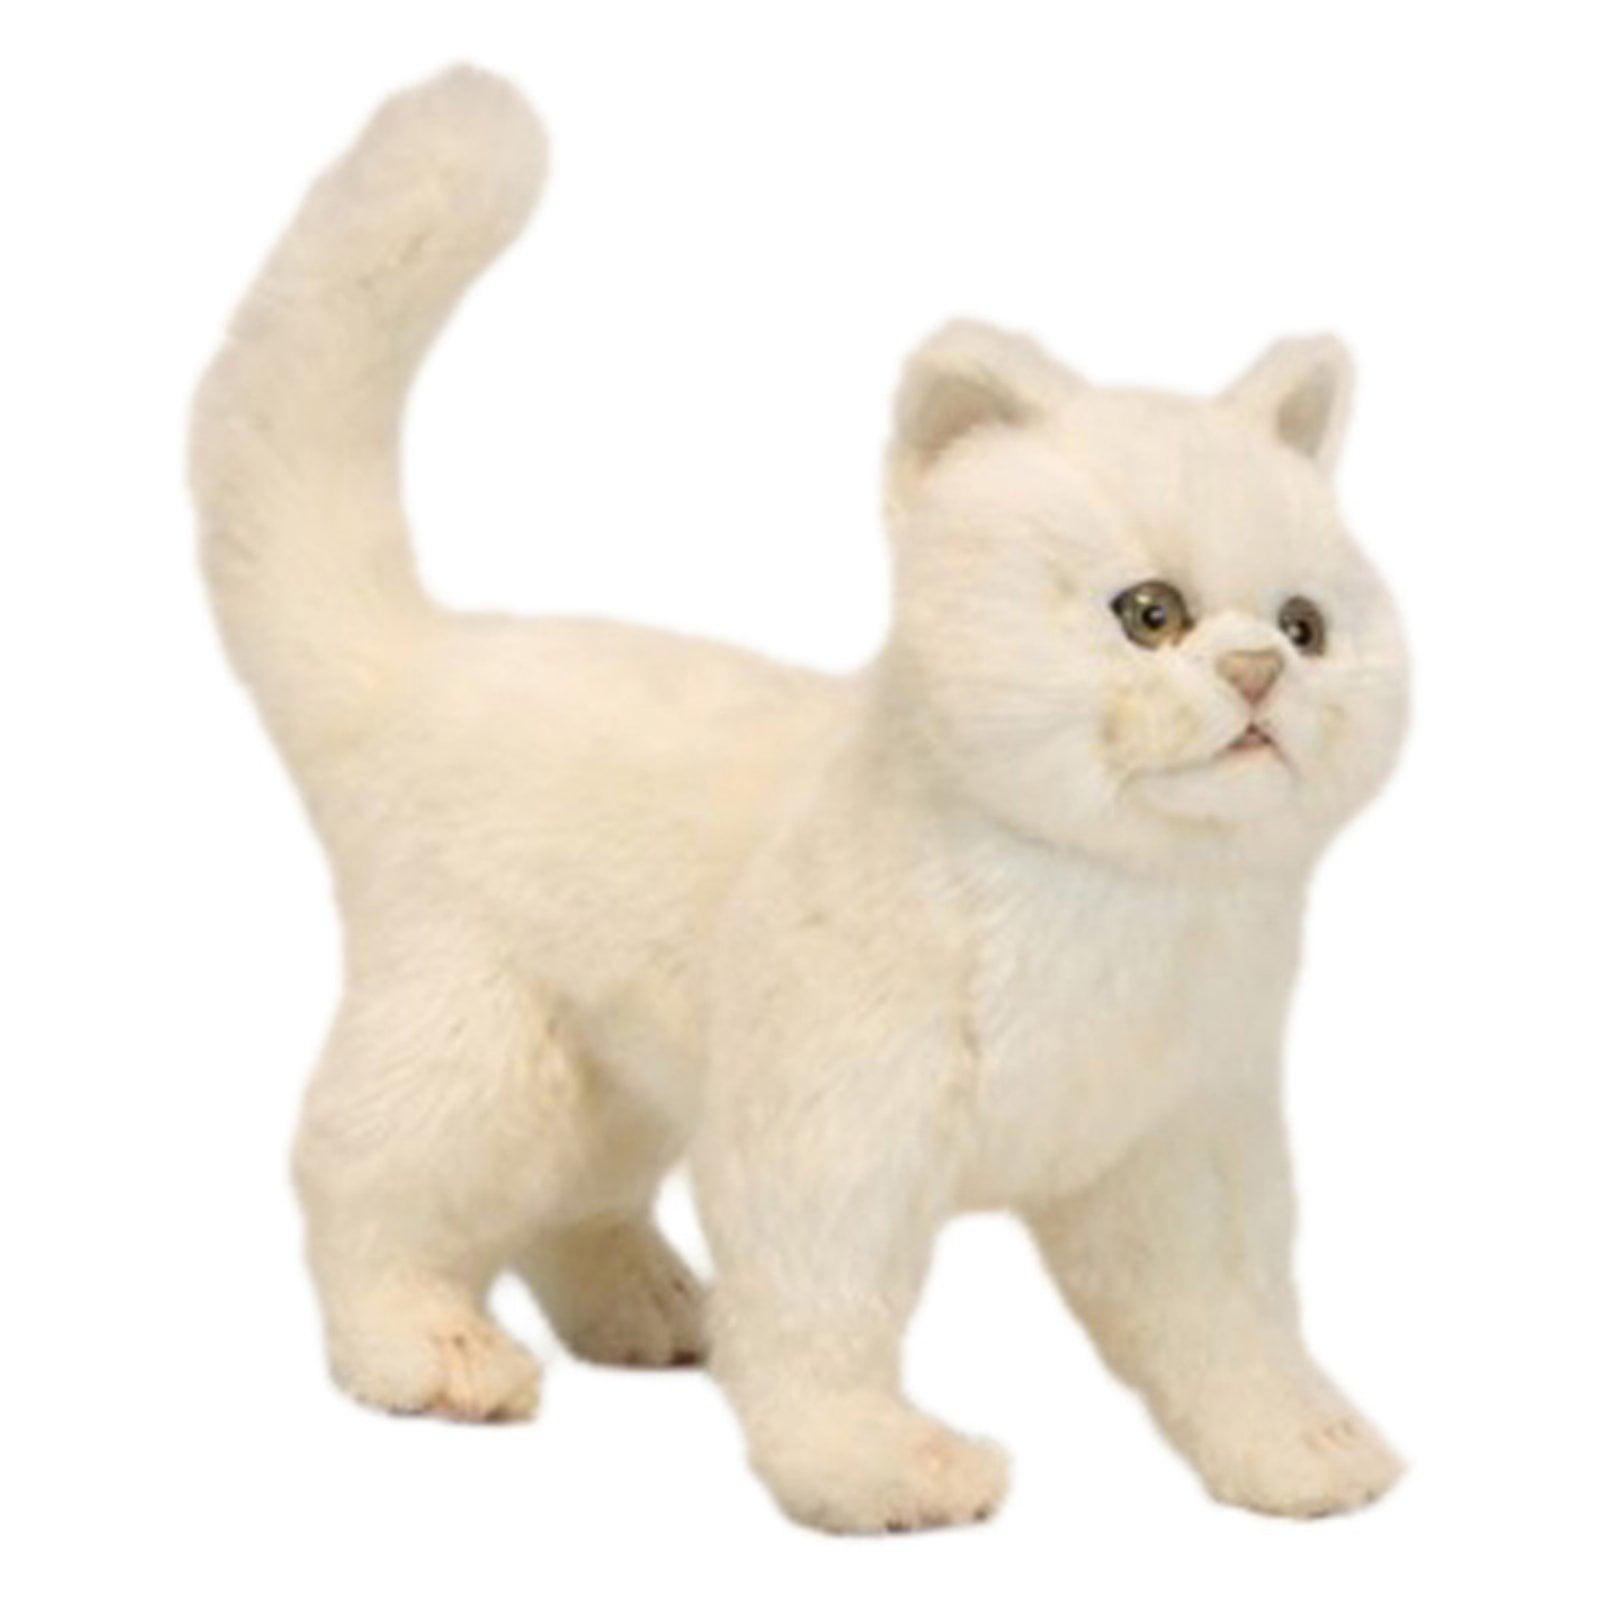 Hansa Crème Kitten Plush Toy by Hansa